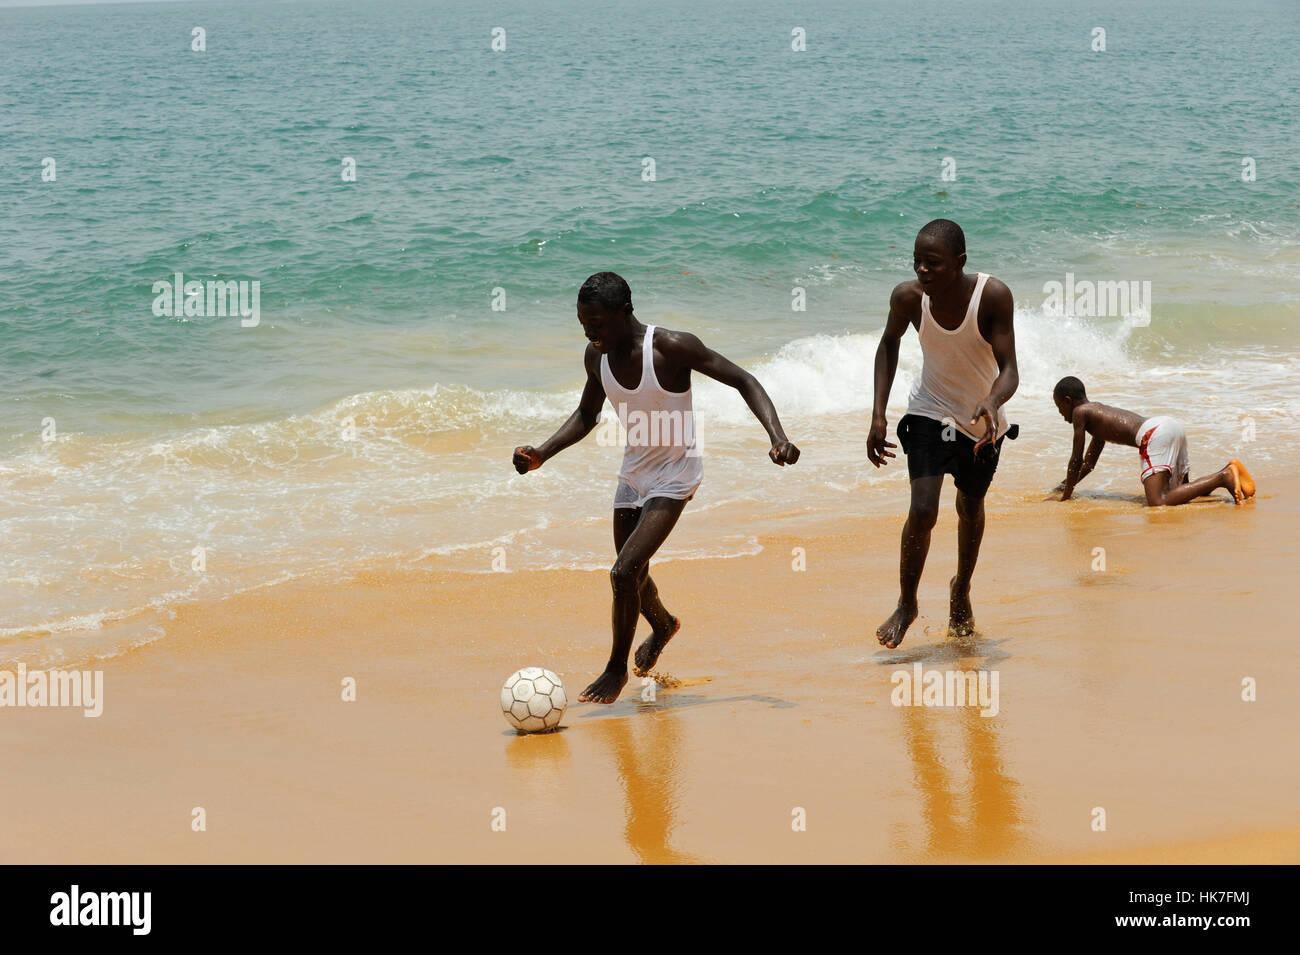 SIERRA LEONE Kent, youngster play soccer at the beach / SIERRA LEONE Kent, Jugendliche spielen Fussball am Strand - Stock Image